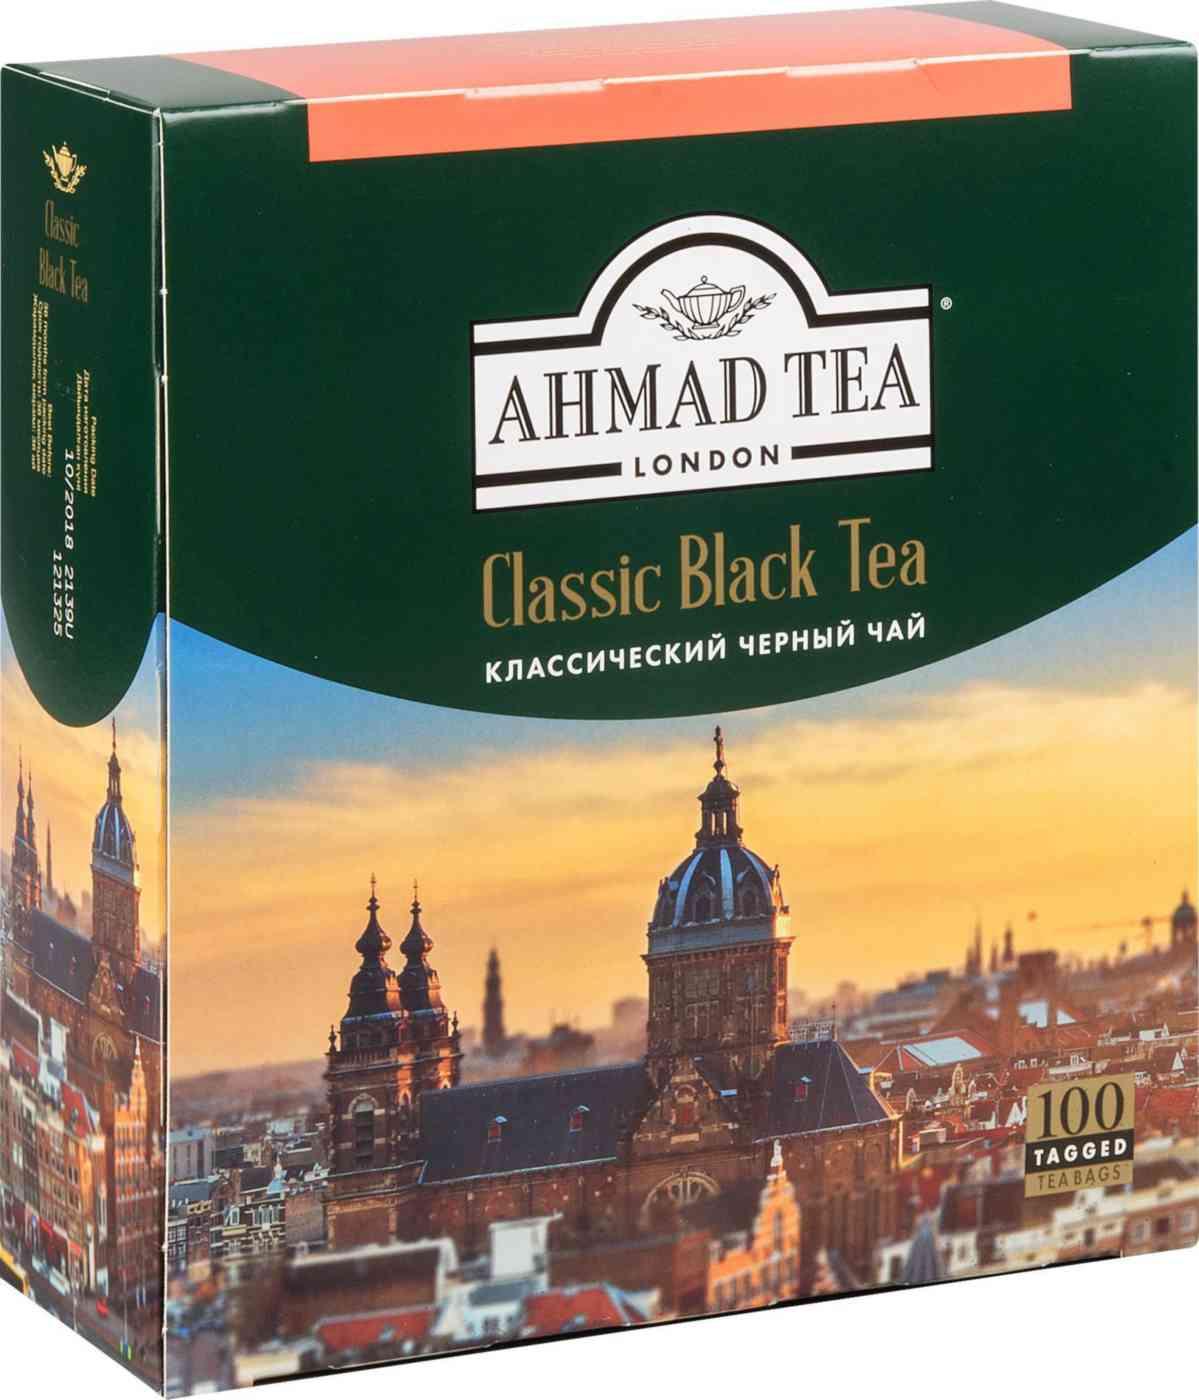 Ahmad tea tea collections | ahmad tea